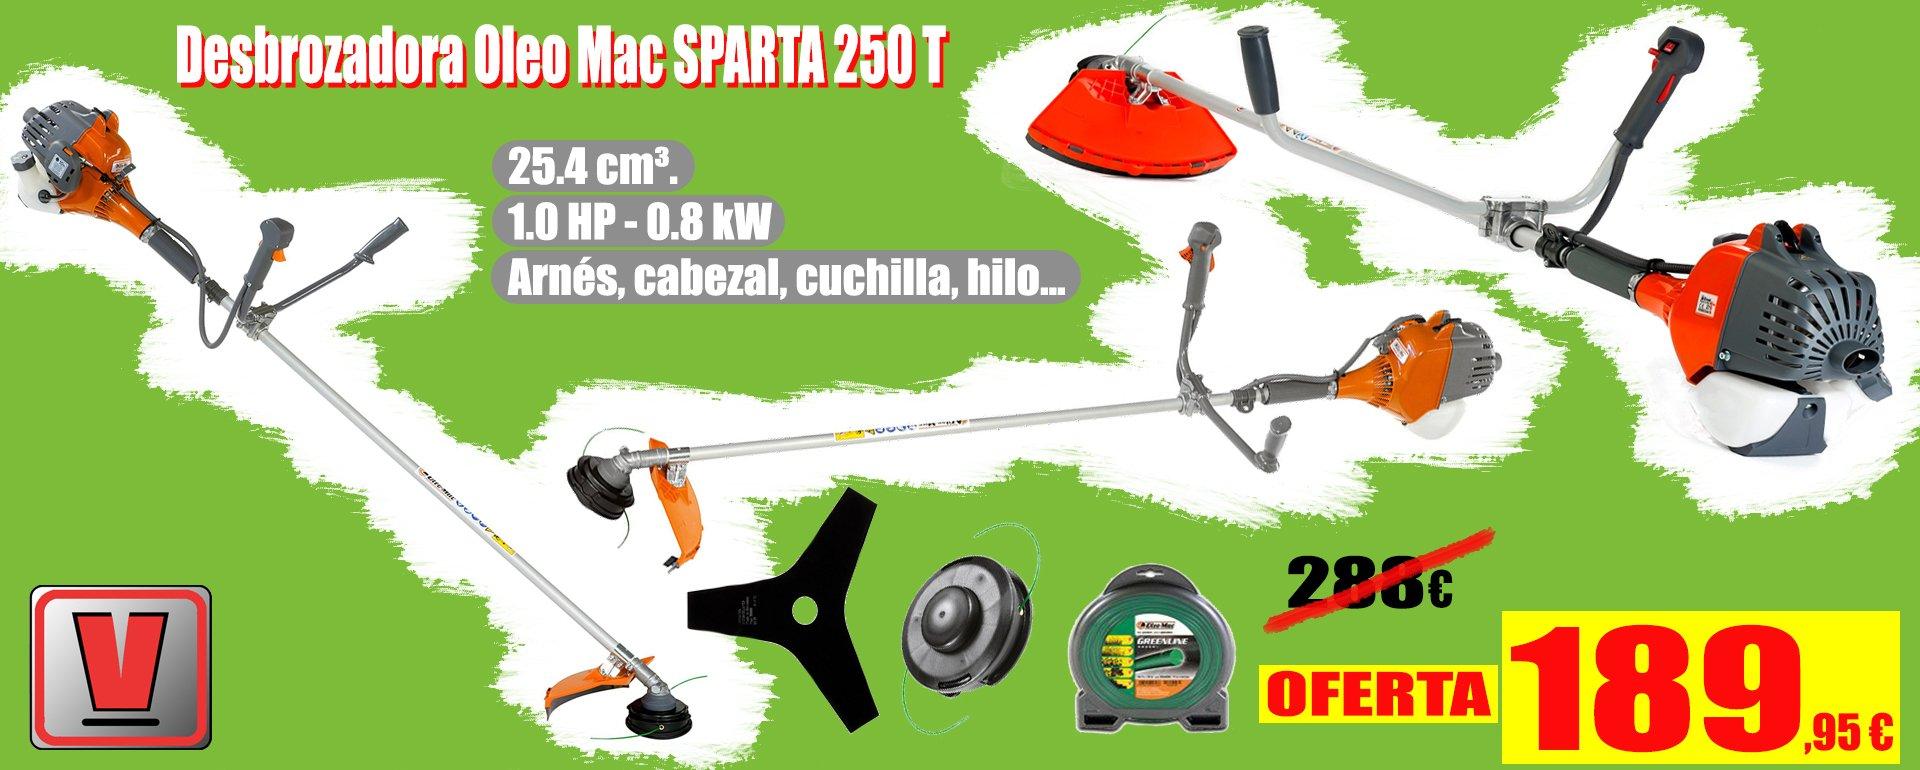 Oleo Mac sparta 250